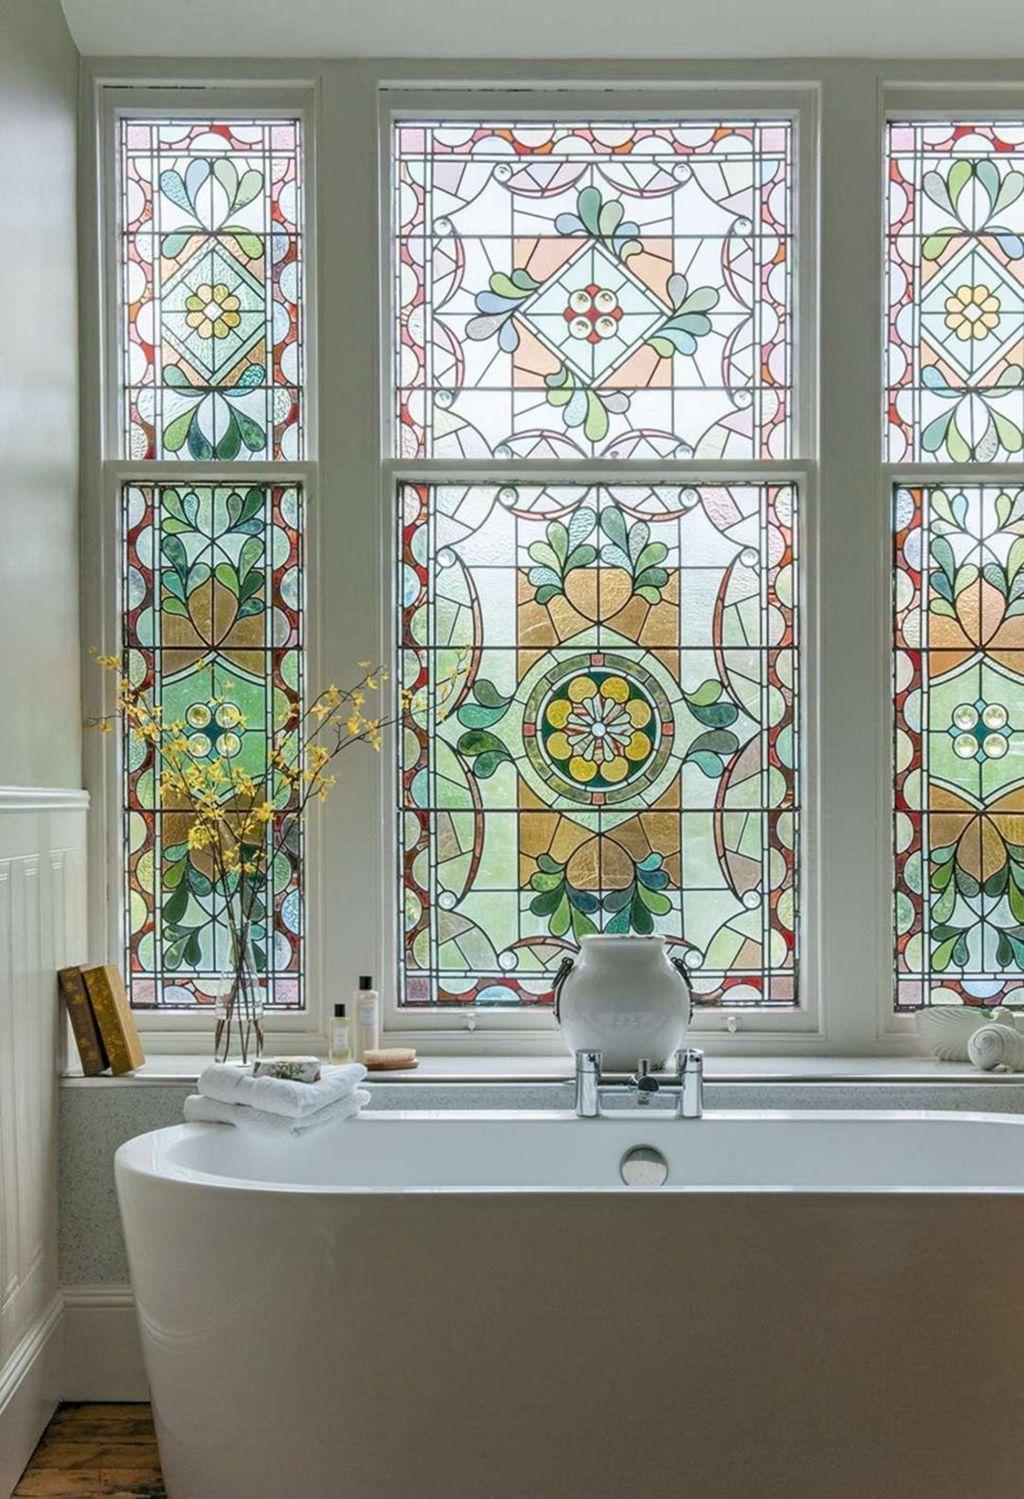 22 Stunning Stained Glass Windows Design Ideas  Window design